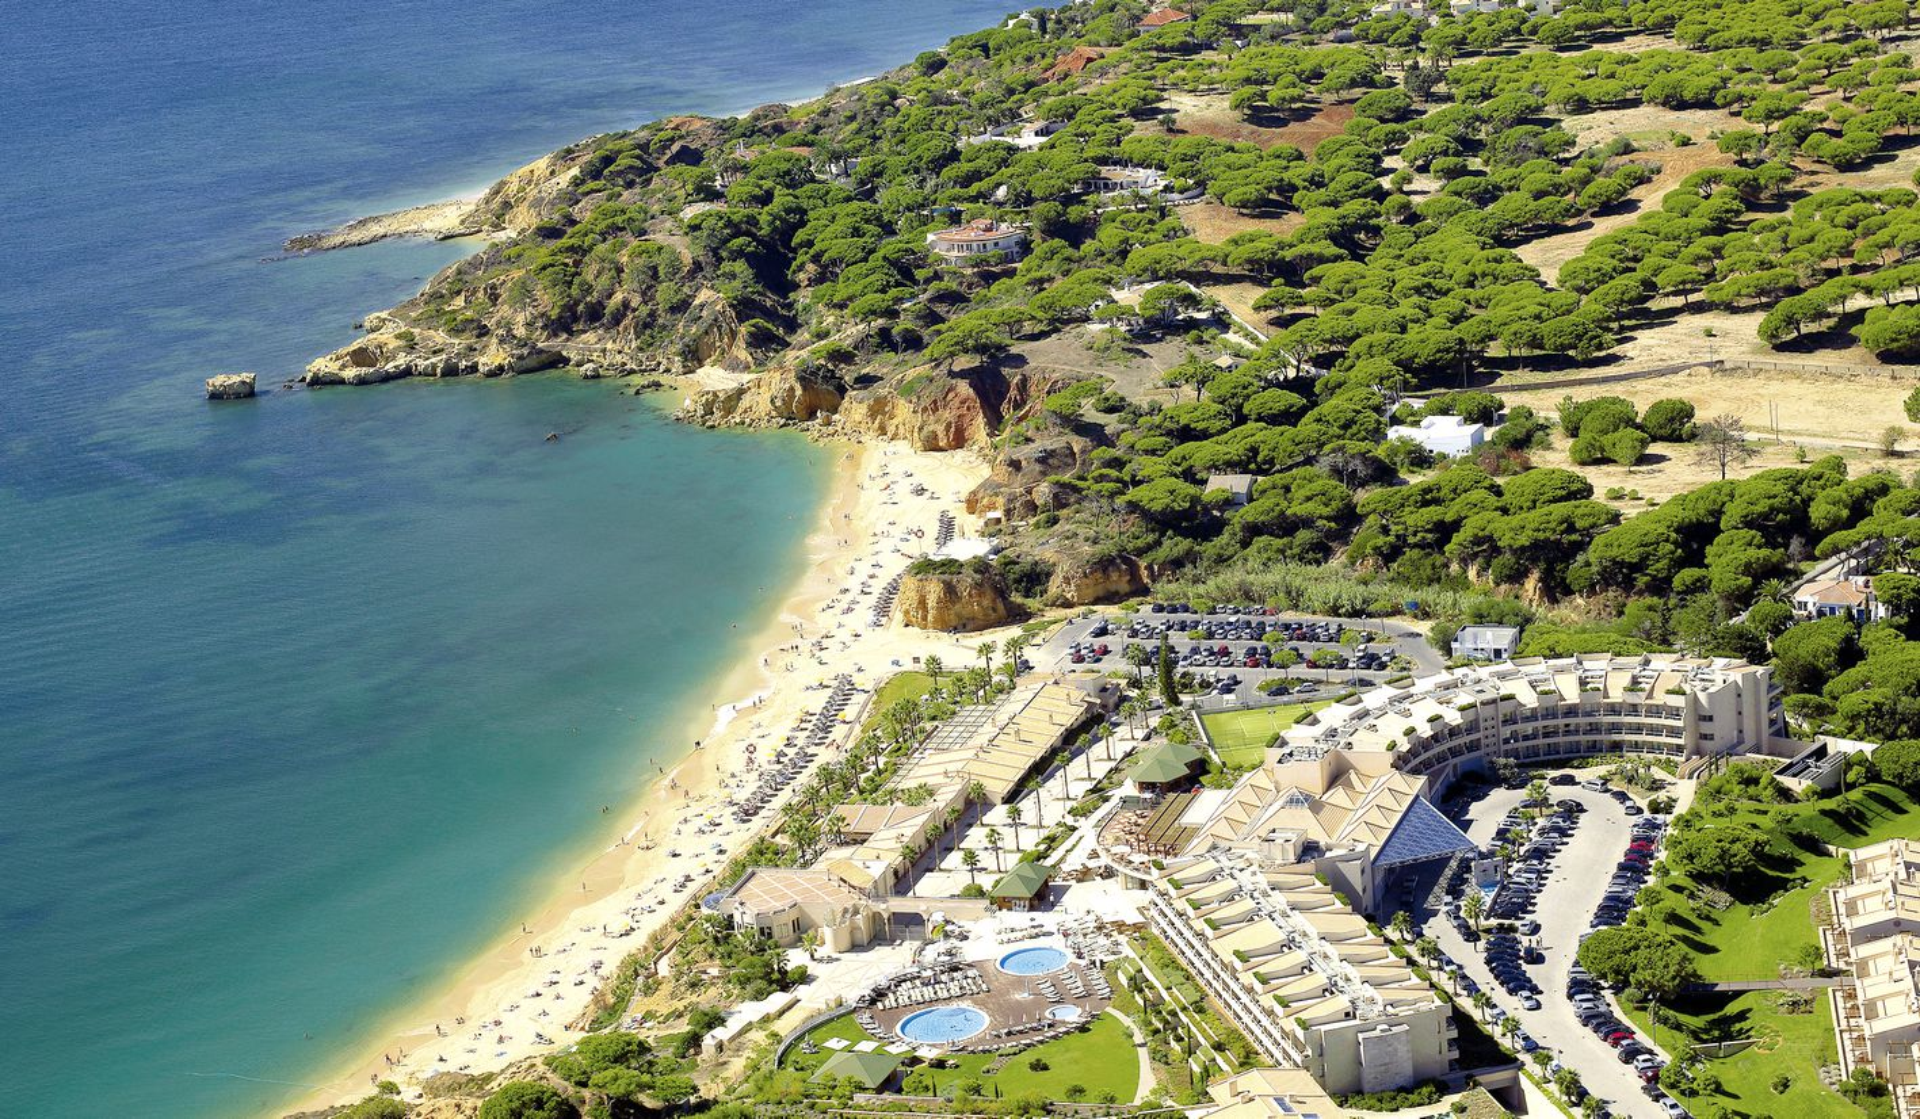 Grande Real Santa Eulália Resort & Hotel Spa - 5*